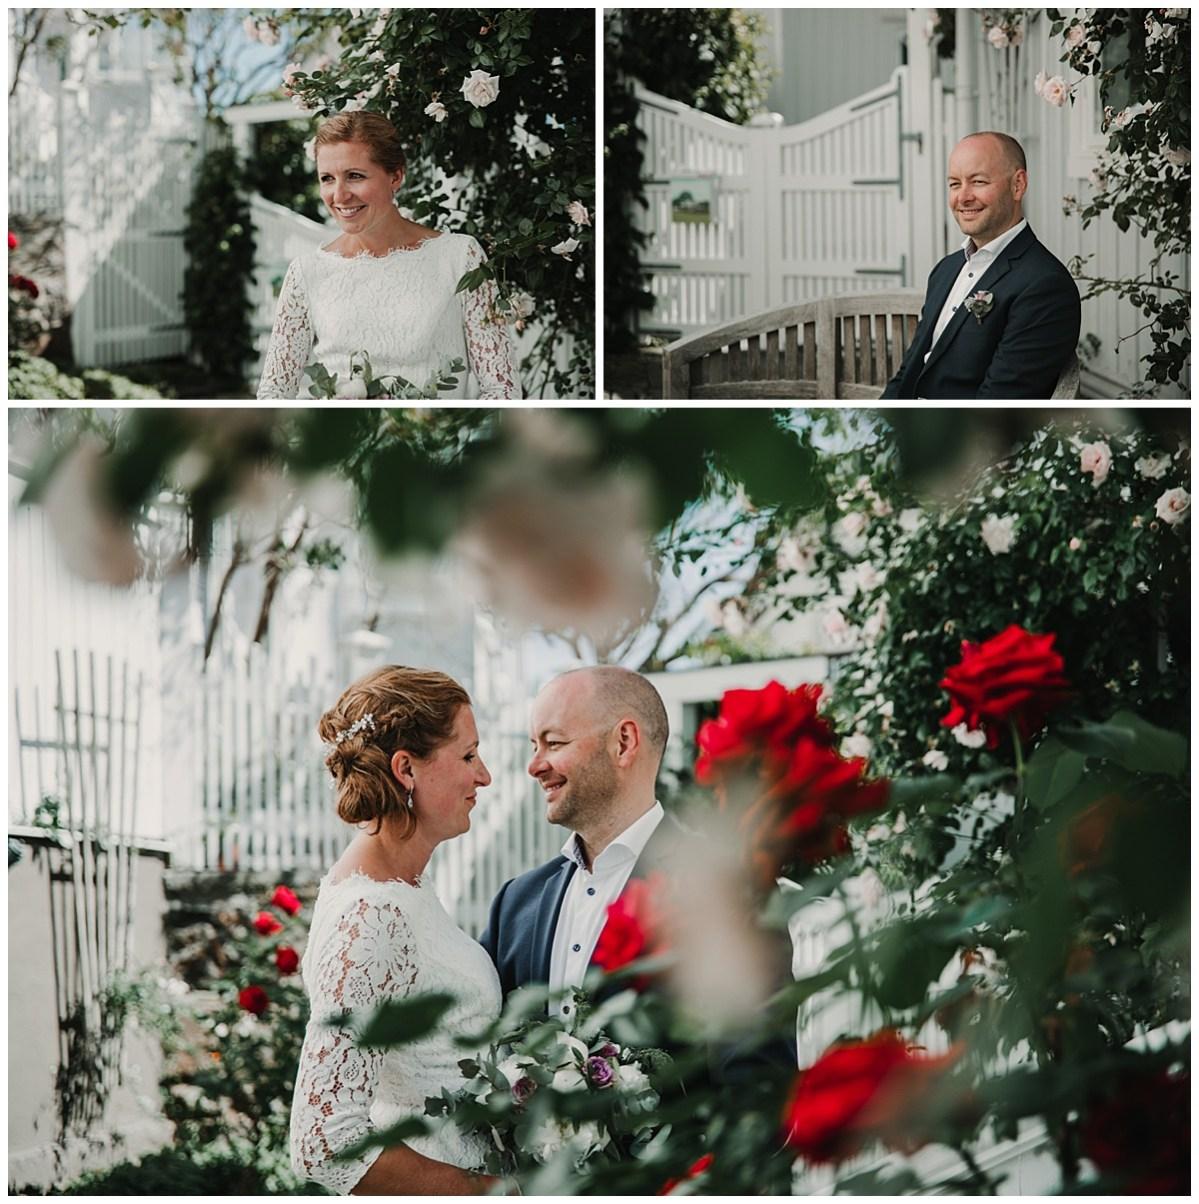 bröllopsfotograf Marstrand porträtt blommor wedding photographer flowers portrait